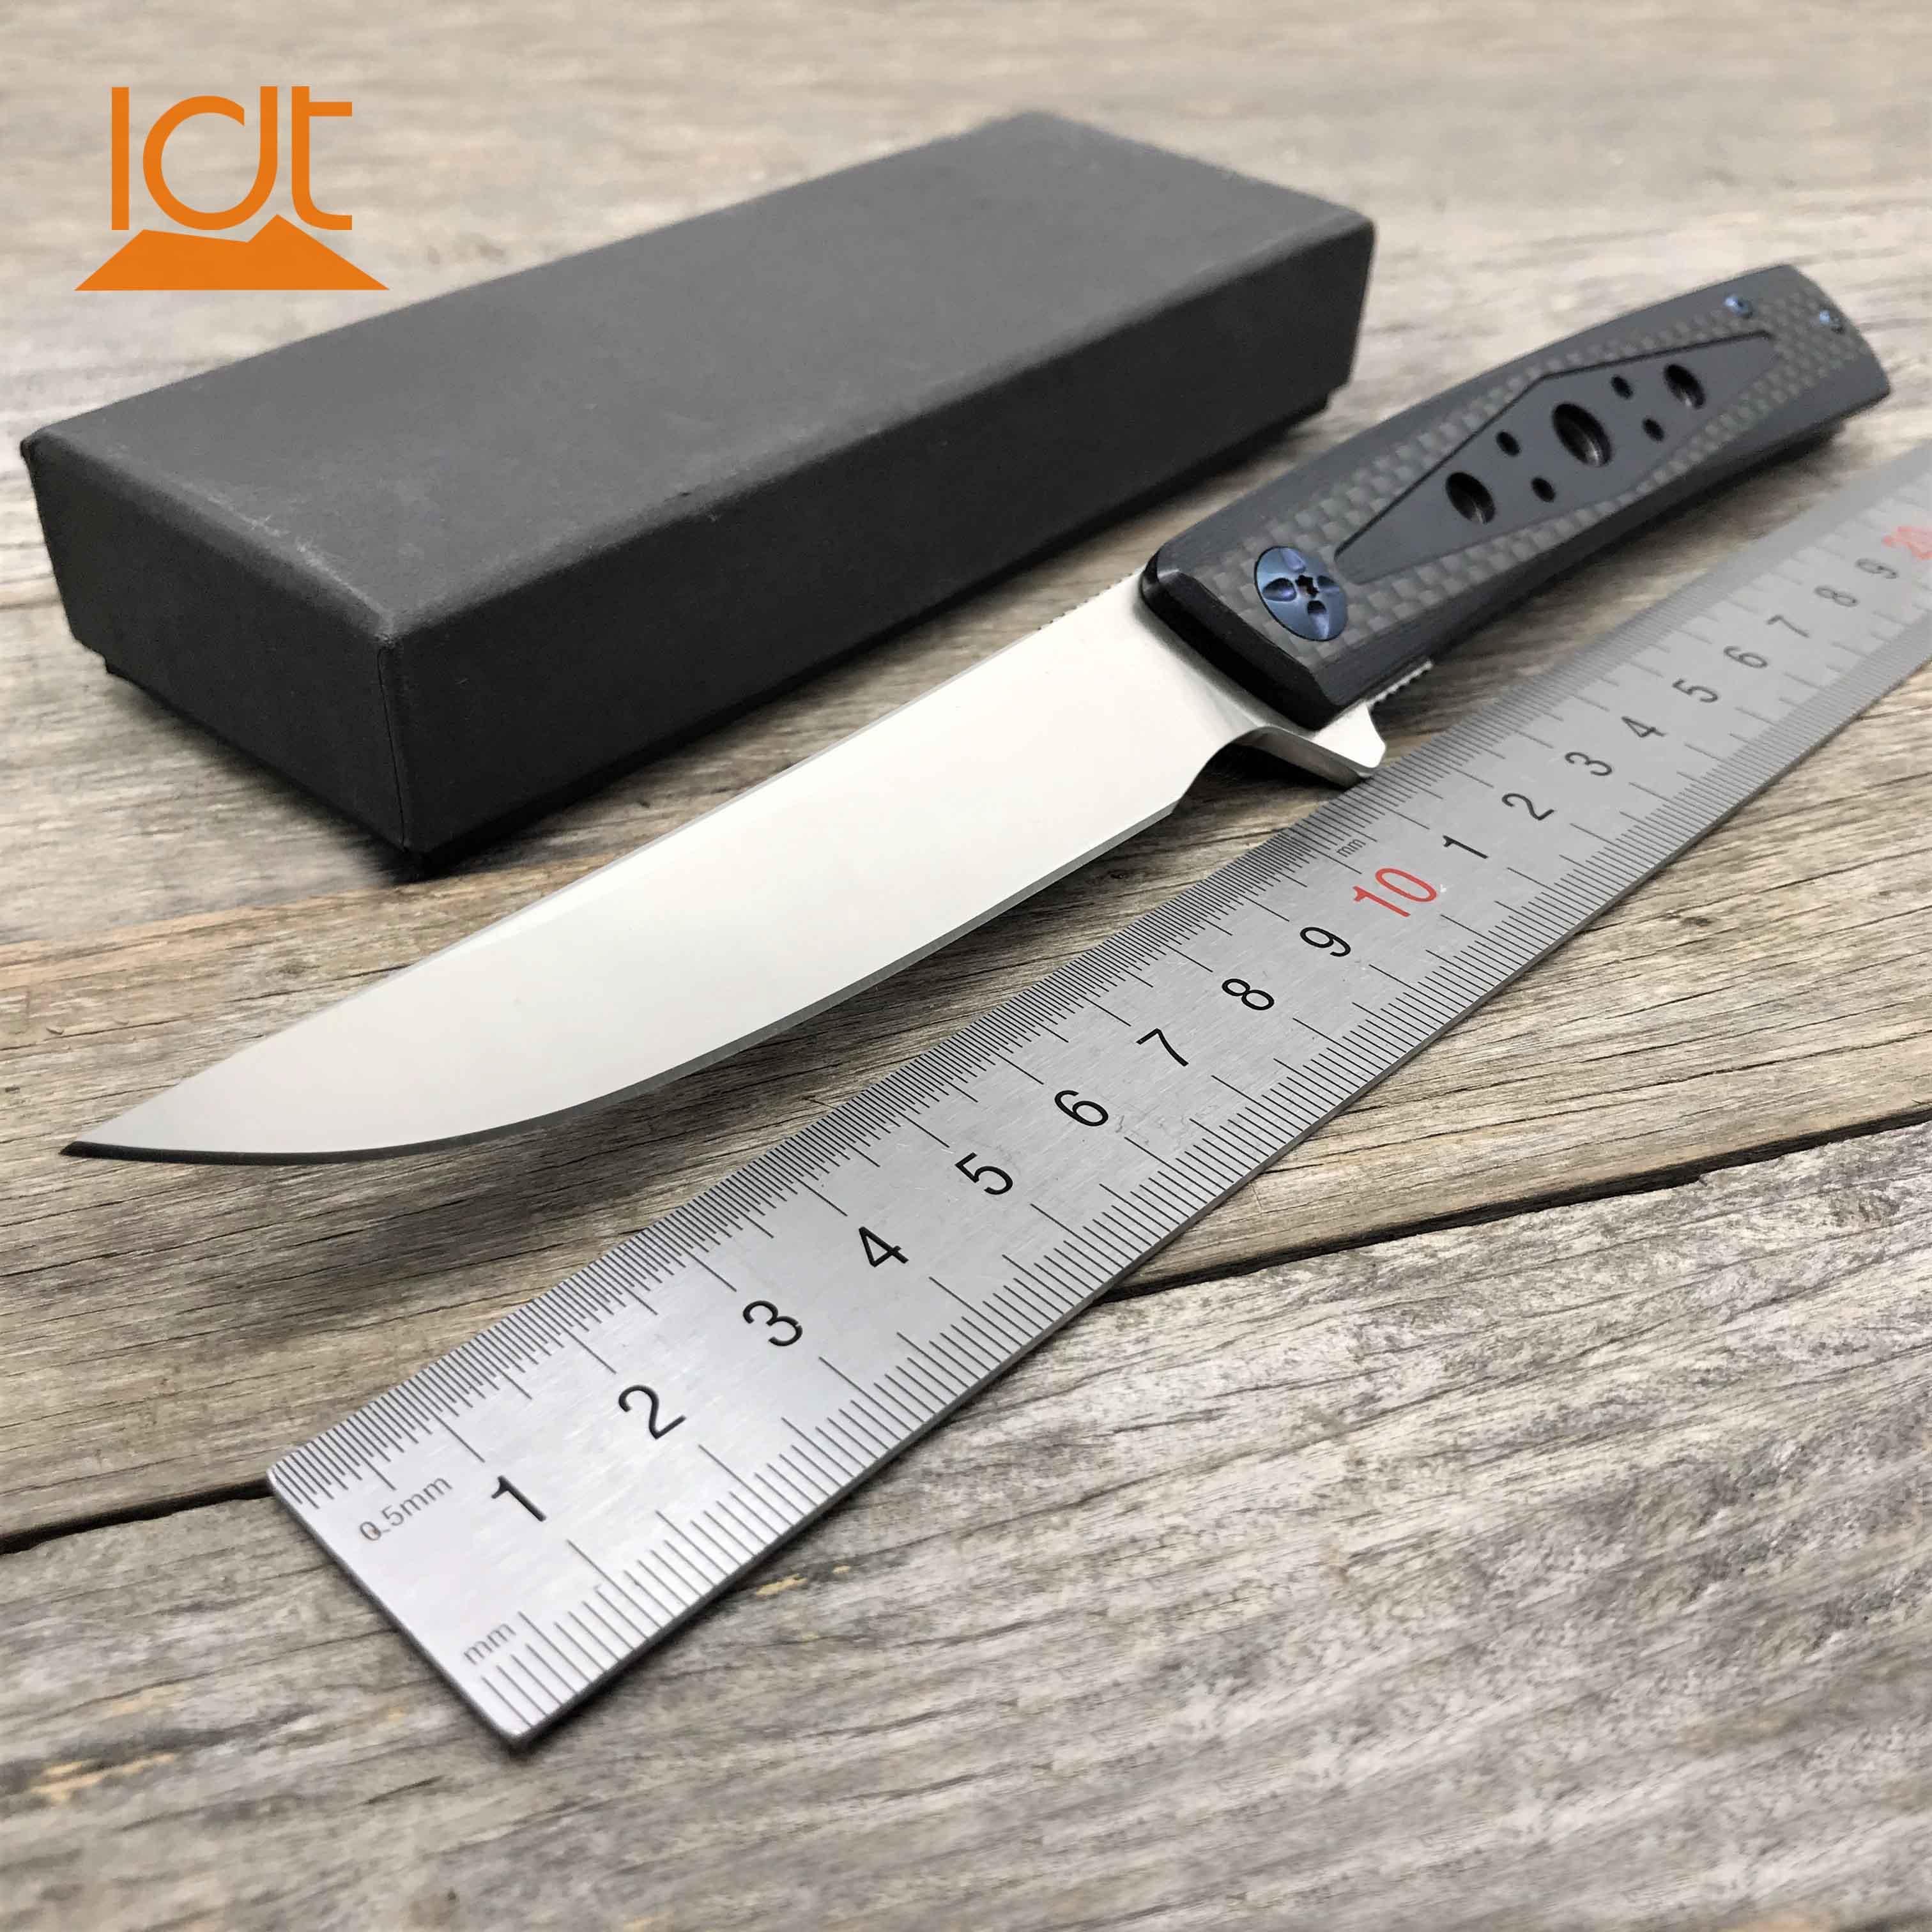 LDT D25 Folding Knife D2 Blade Carbon Fiber G10 Handle Ceramic Ball Bearing knife Hunting Survival Tactical Camping Knives Tool